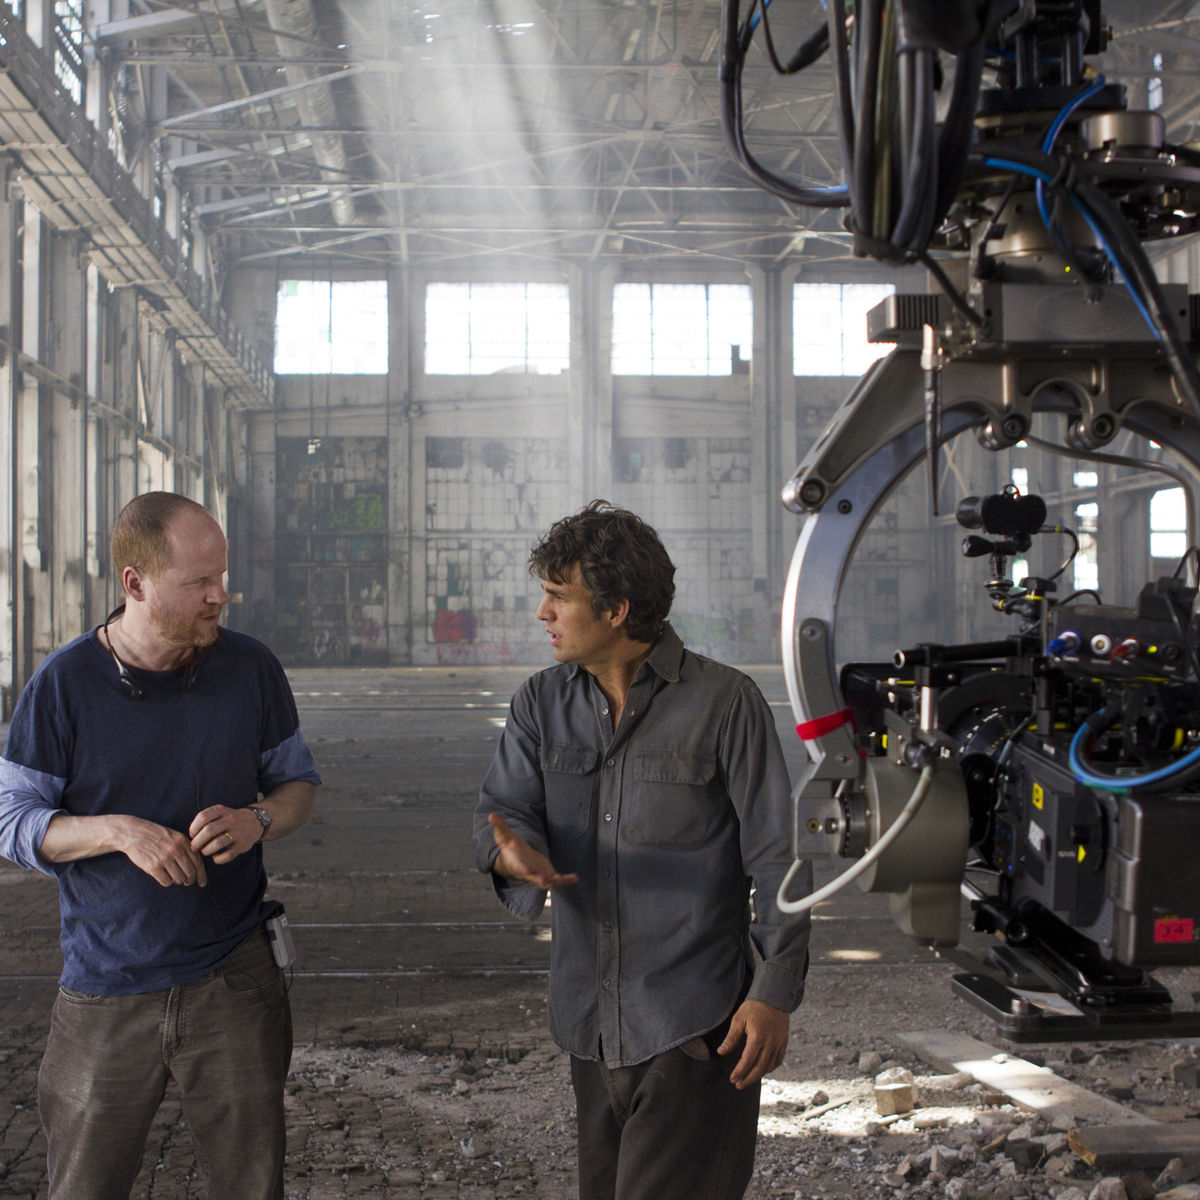 The-Avengers-Joss-Whedon-Directs-Mark-Ruffalo_0.jpg